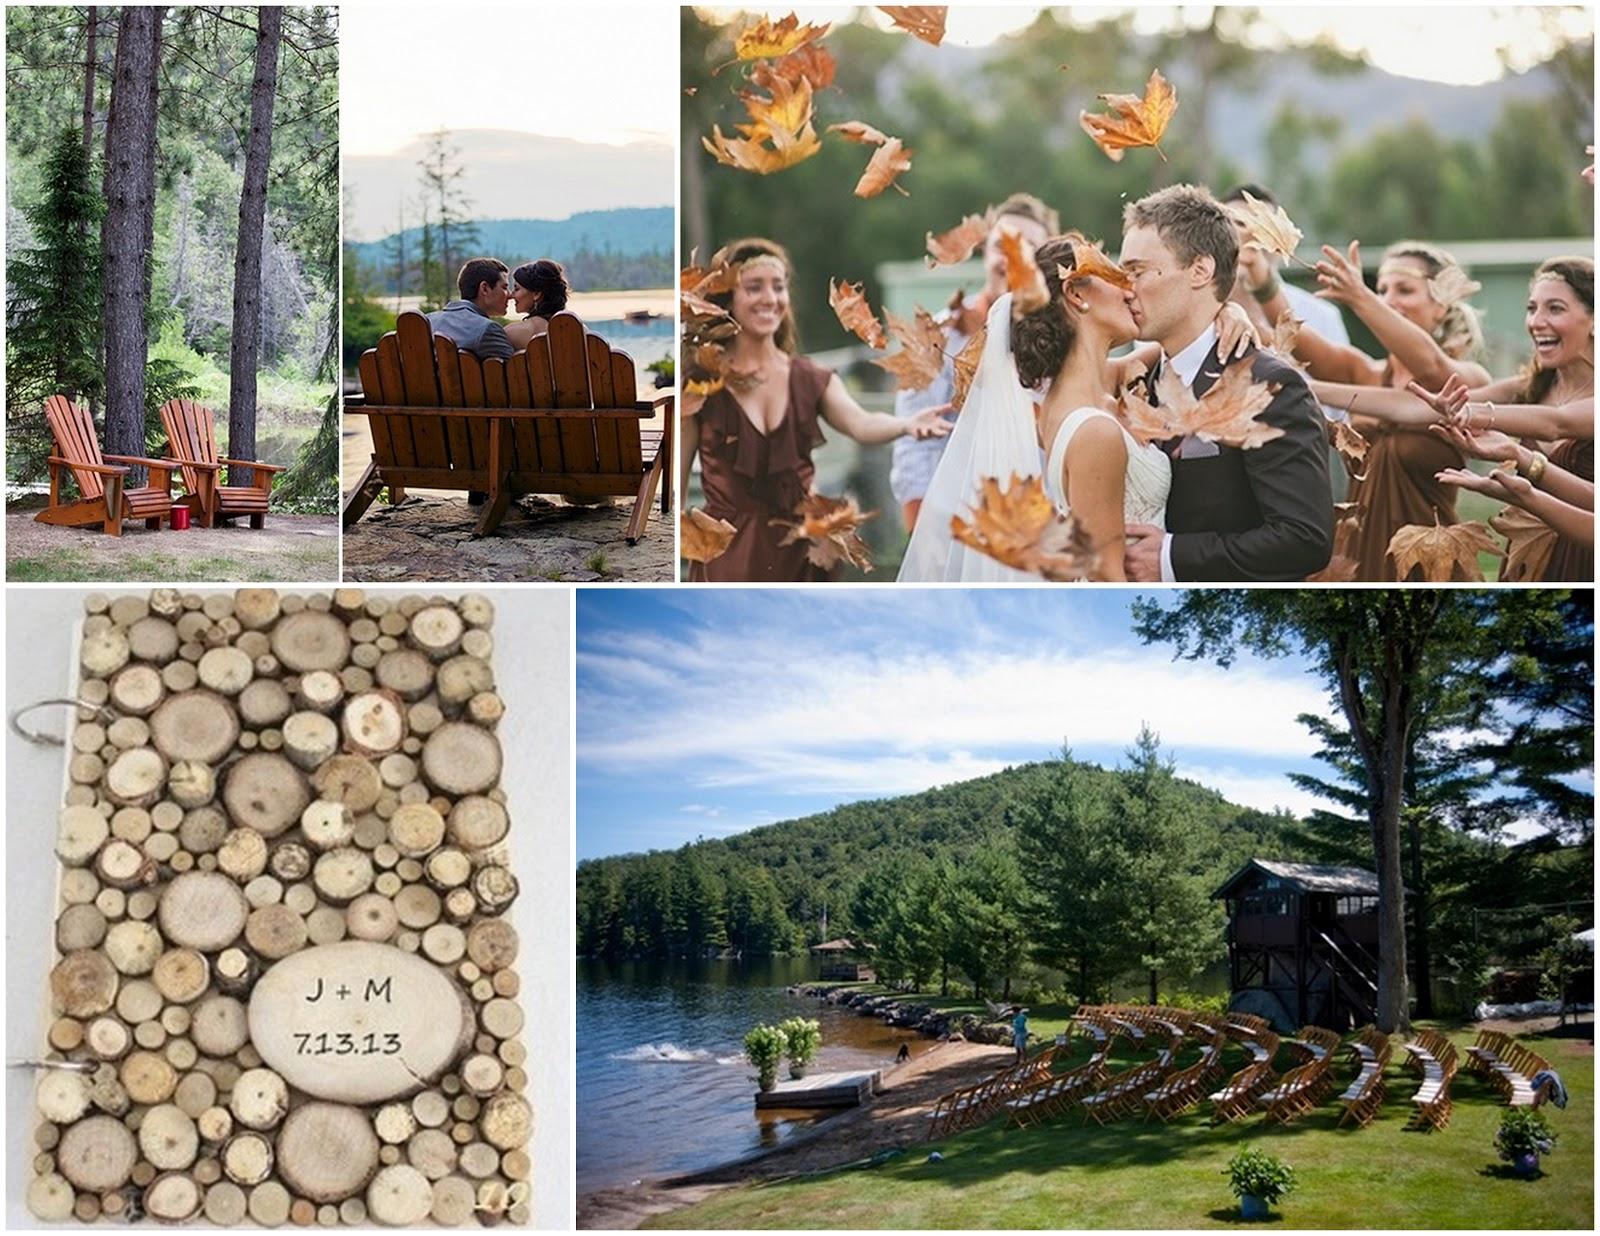 Adirondack Chair Photo Frame Favors Ergonomic High Back Blue Mason Jar Studio Inspired Weddings